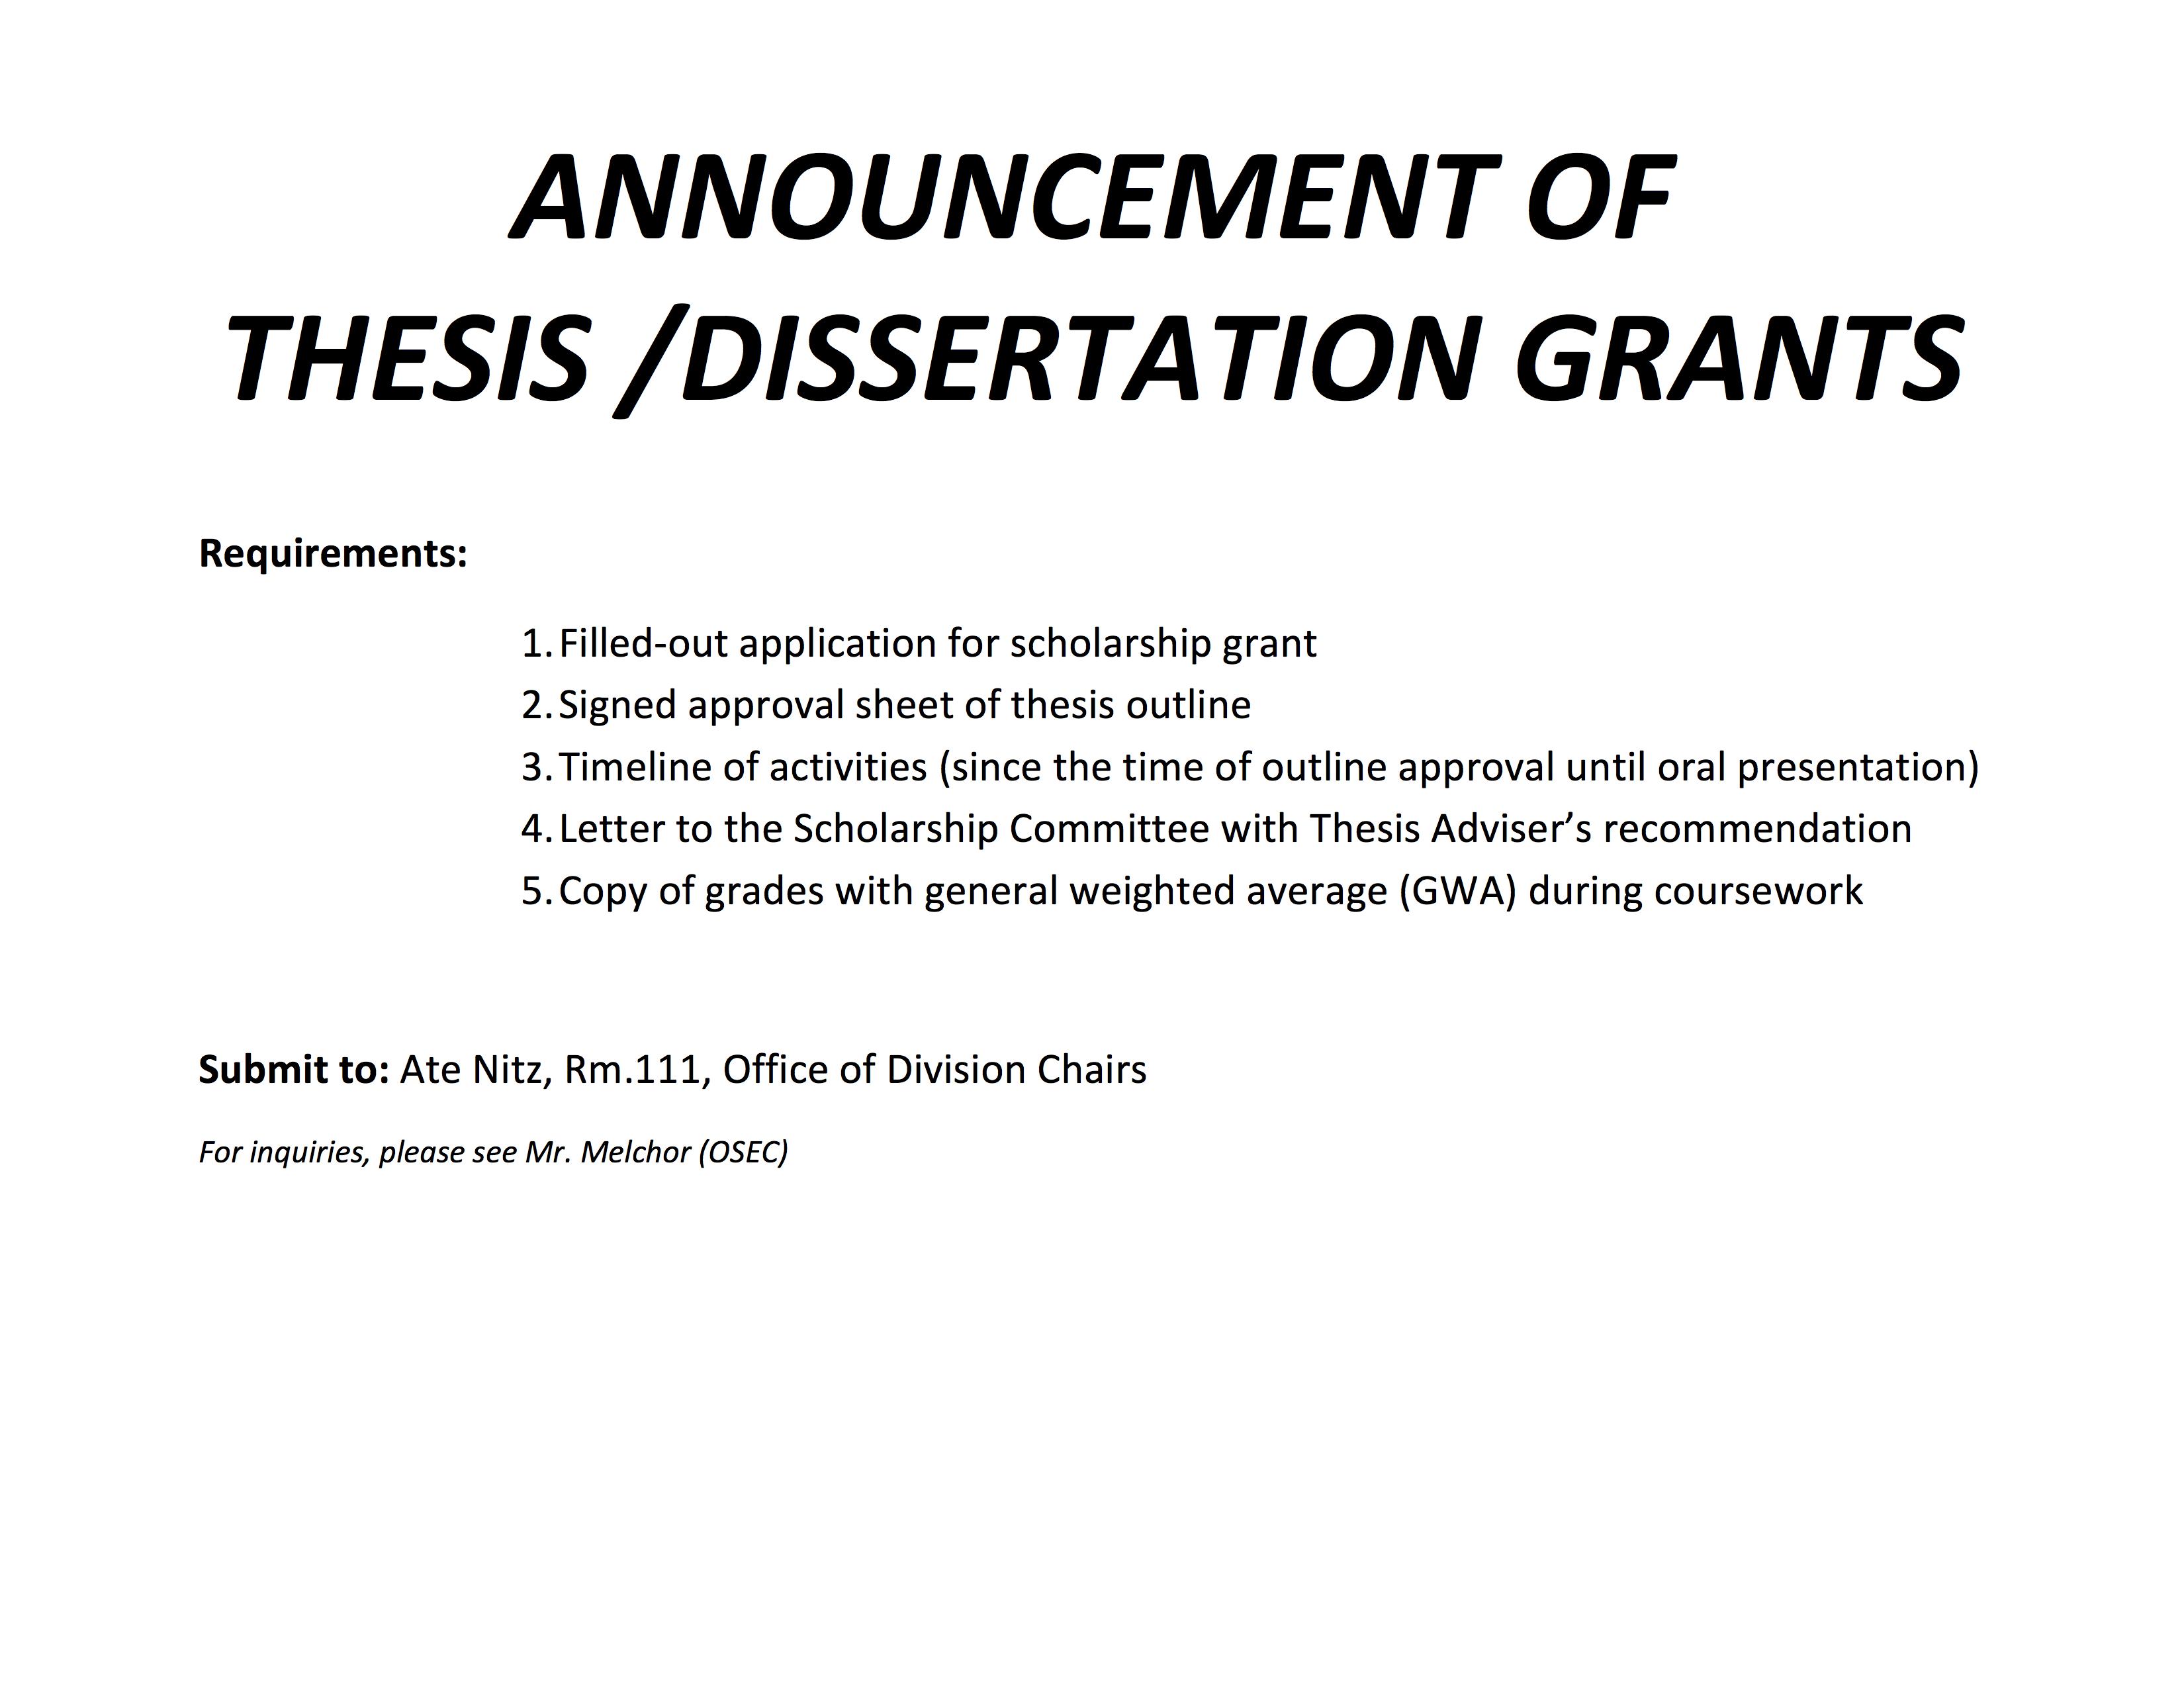 Dissertation Grant - Microsoft Research